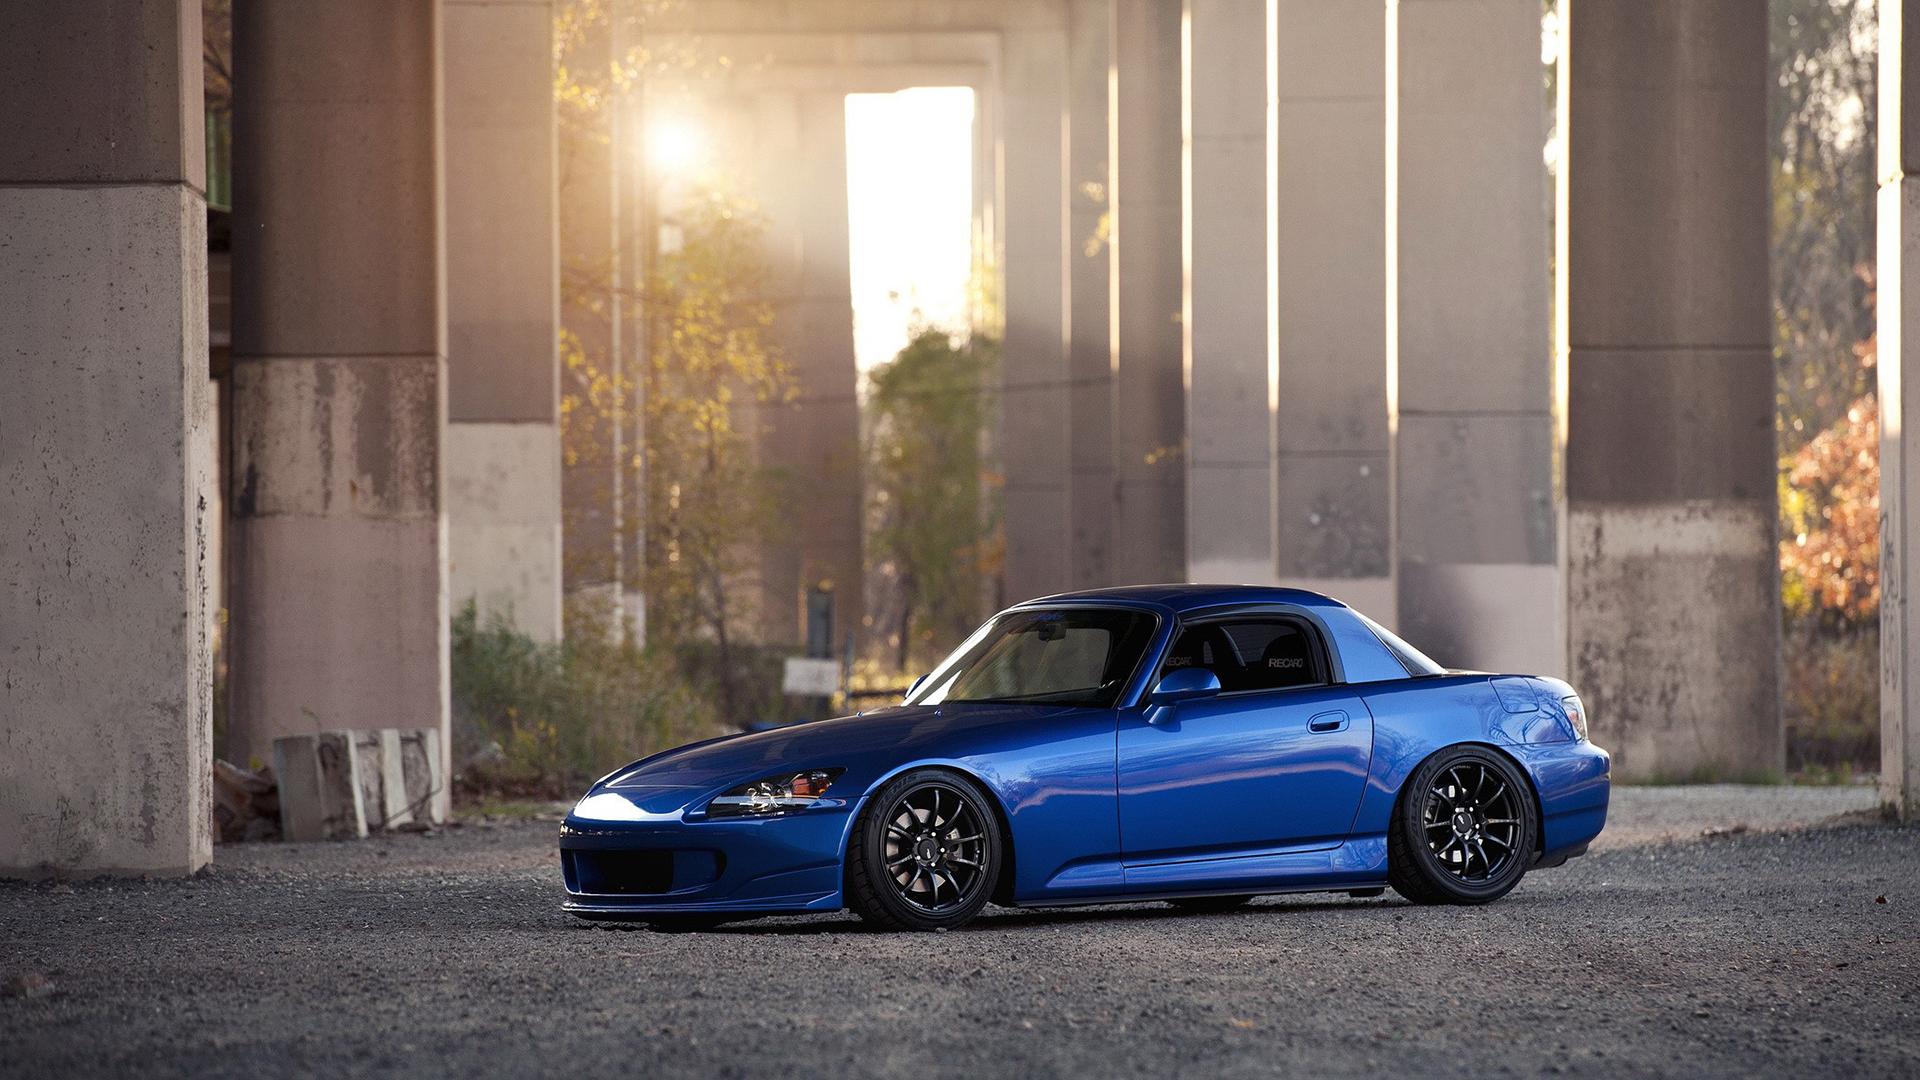 Fast And Furious 7 Cars Wallpapers Hd Honda Civic Wallpaper For Desktop Pixelstalk Net